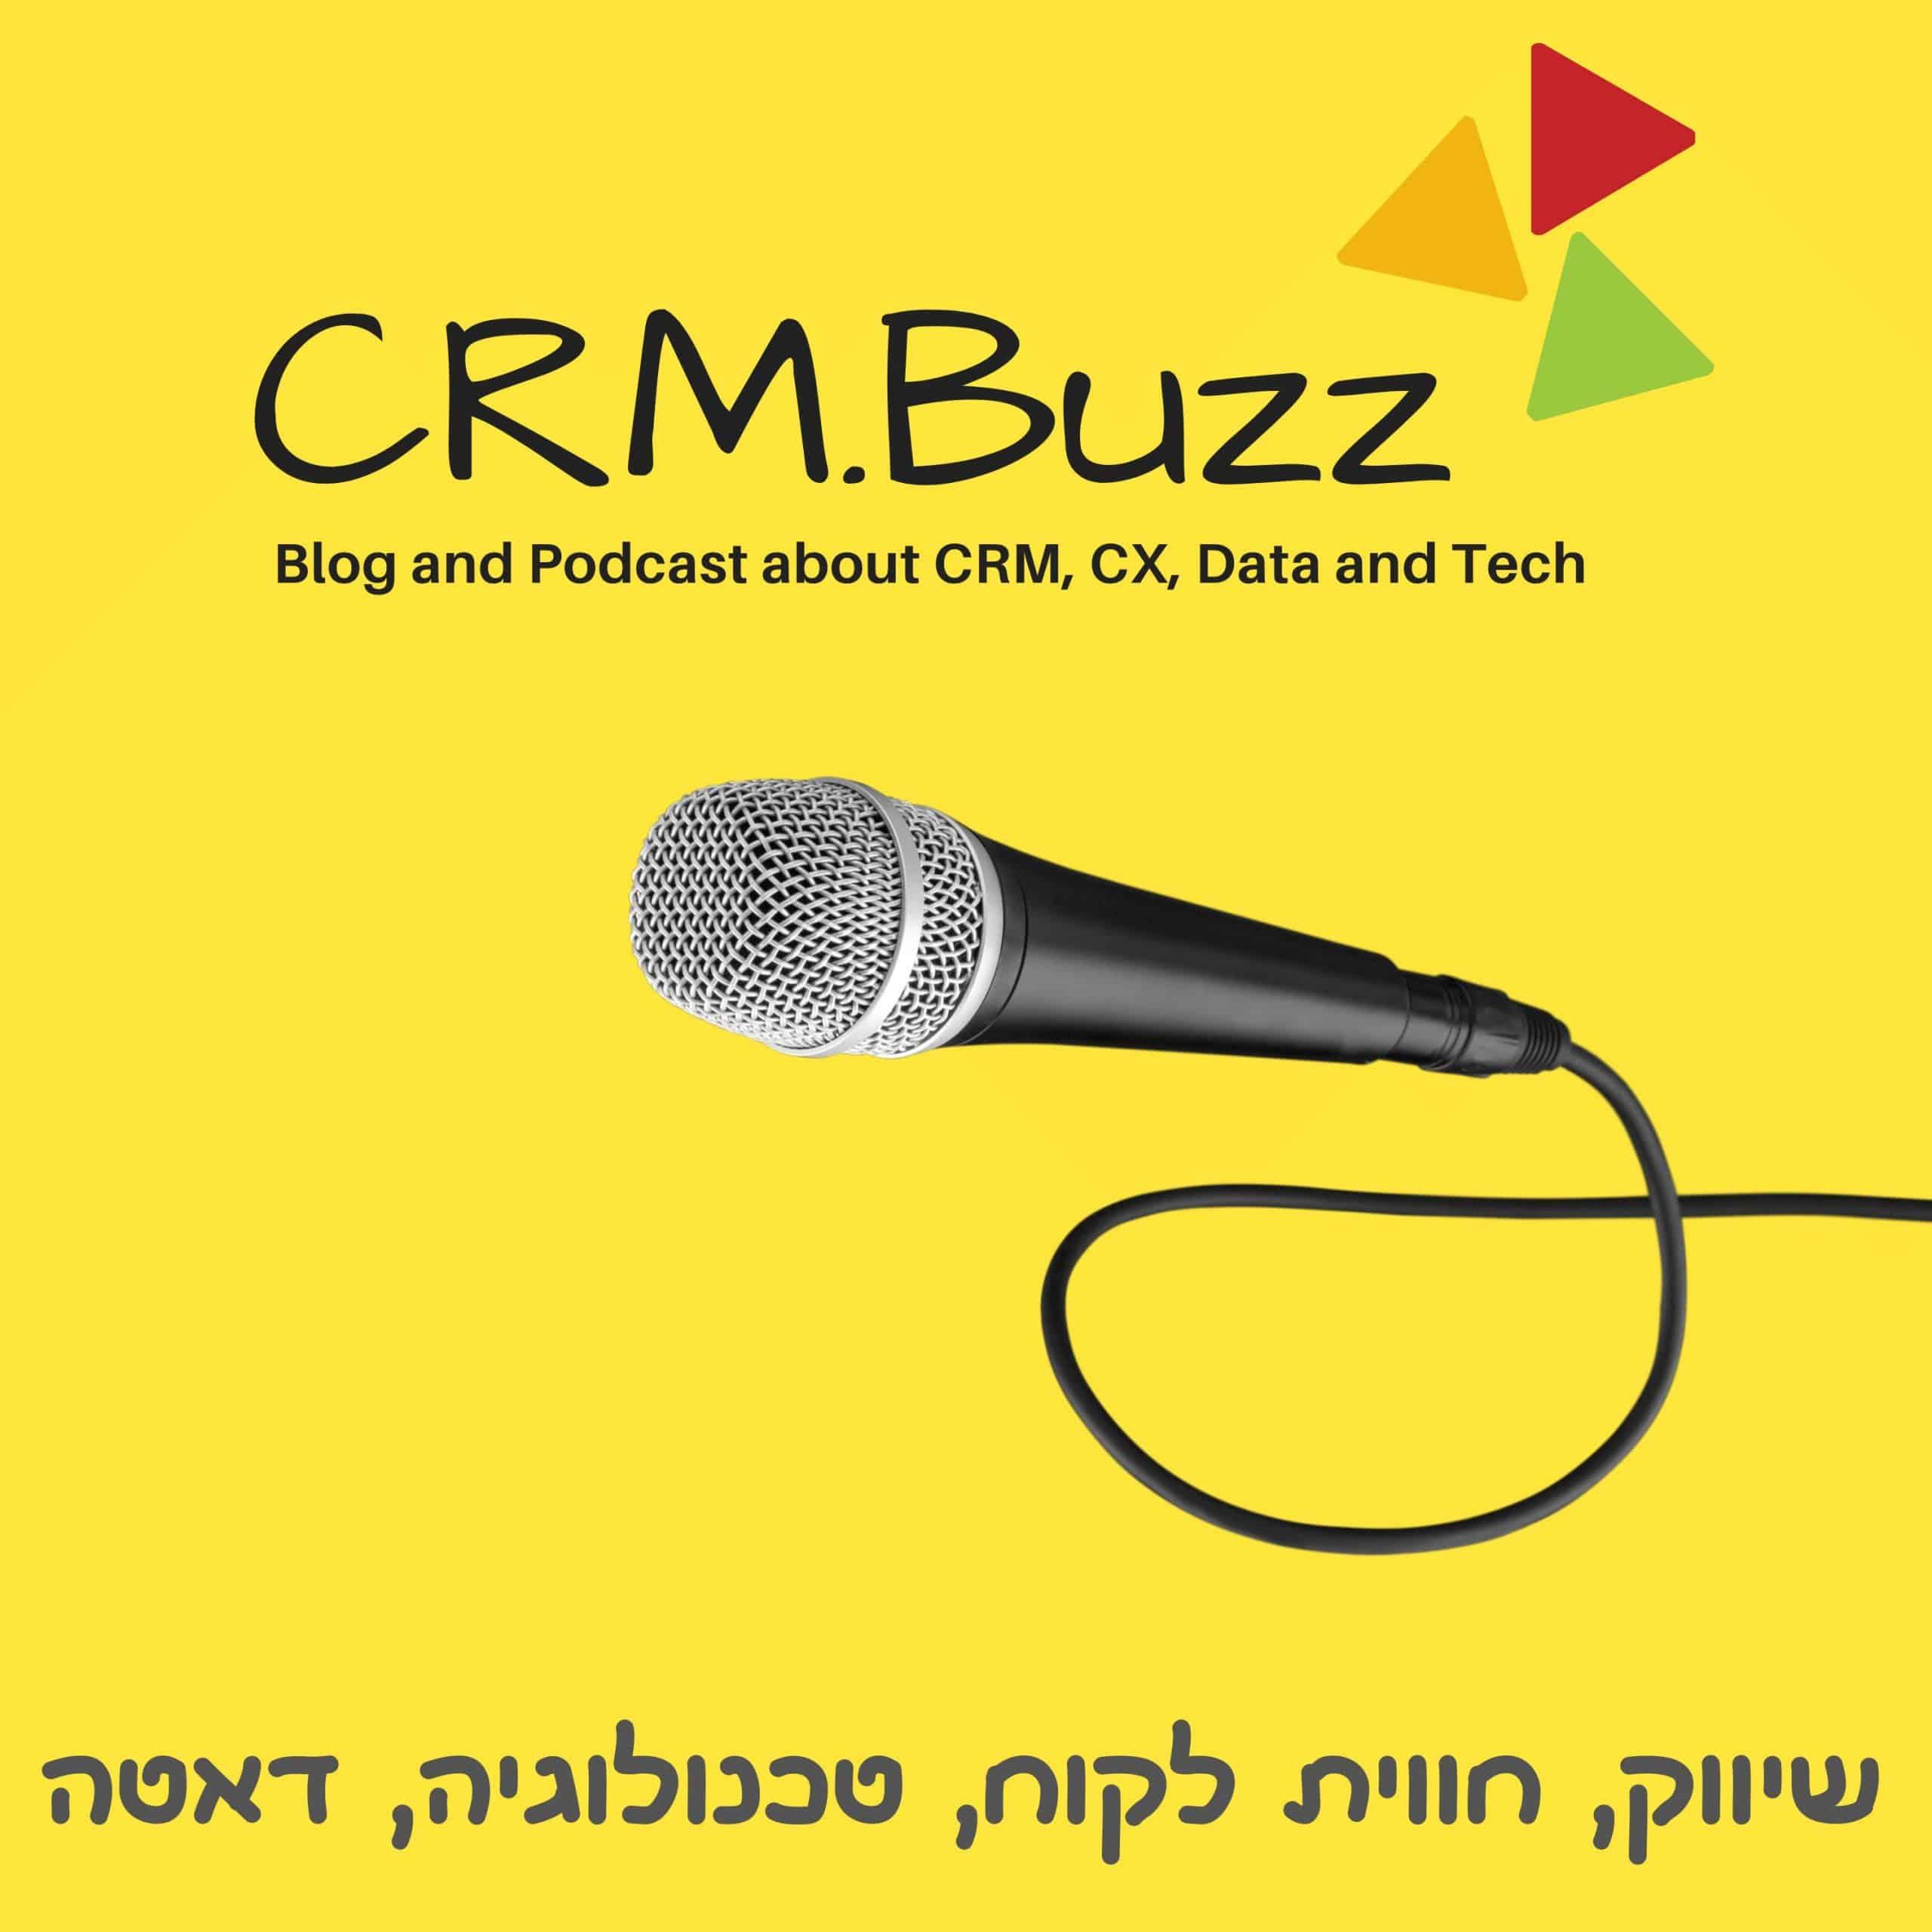 CRM.Buzz